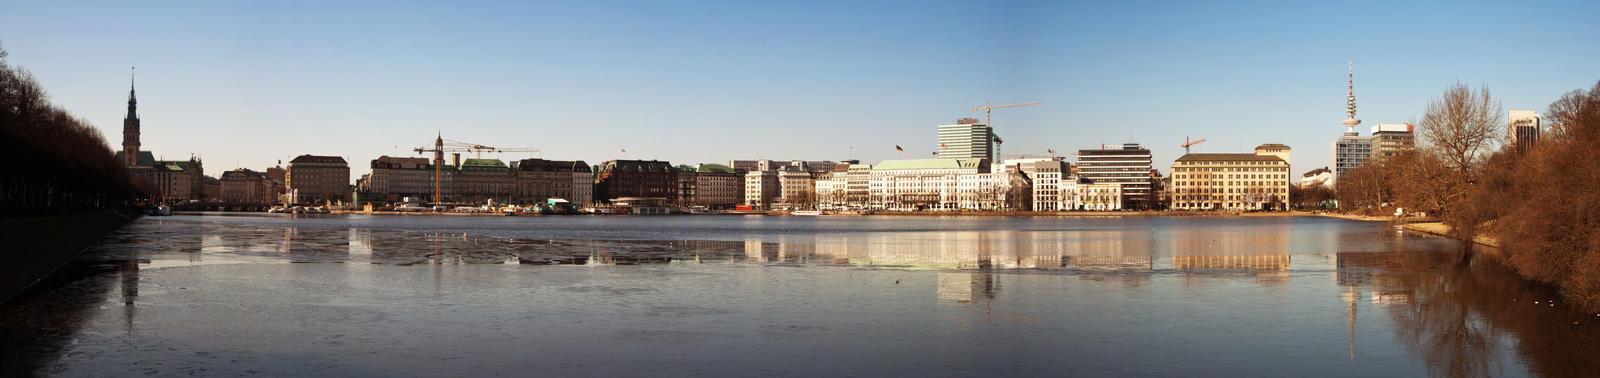 Hamburg Binnenalster V. 1.0